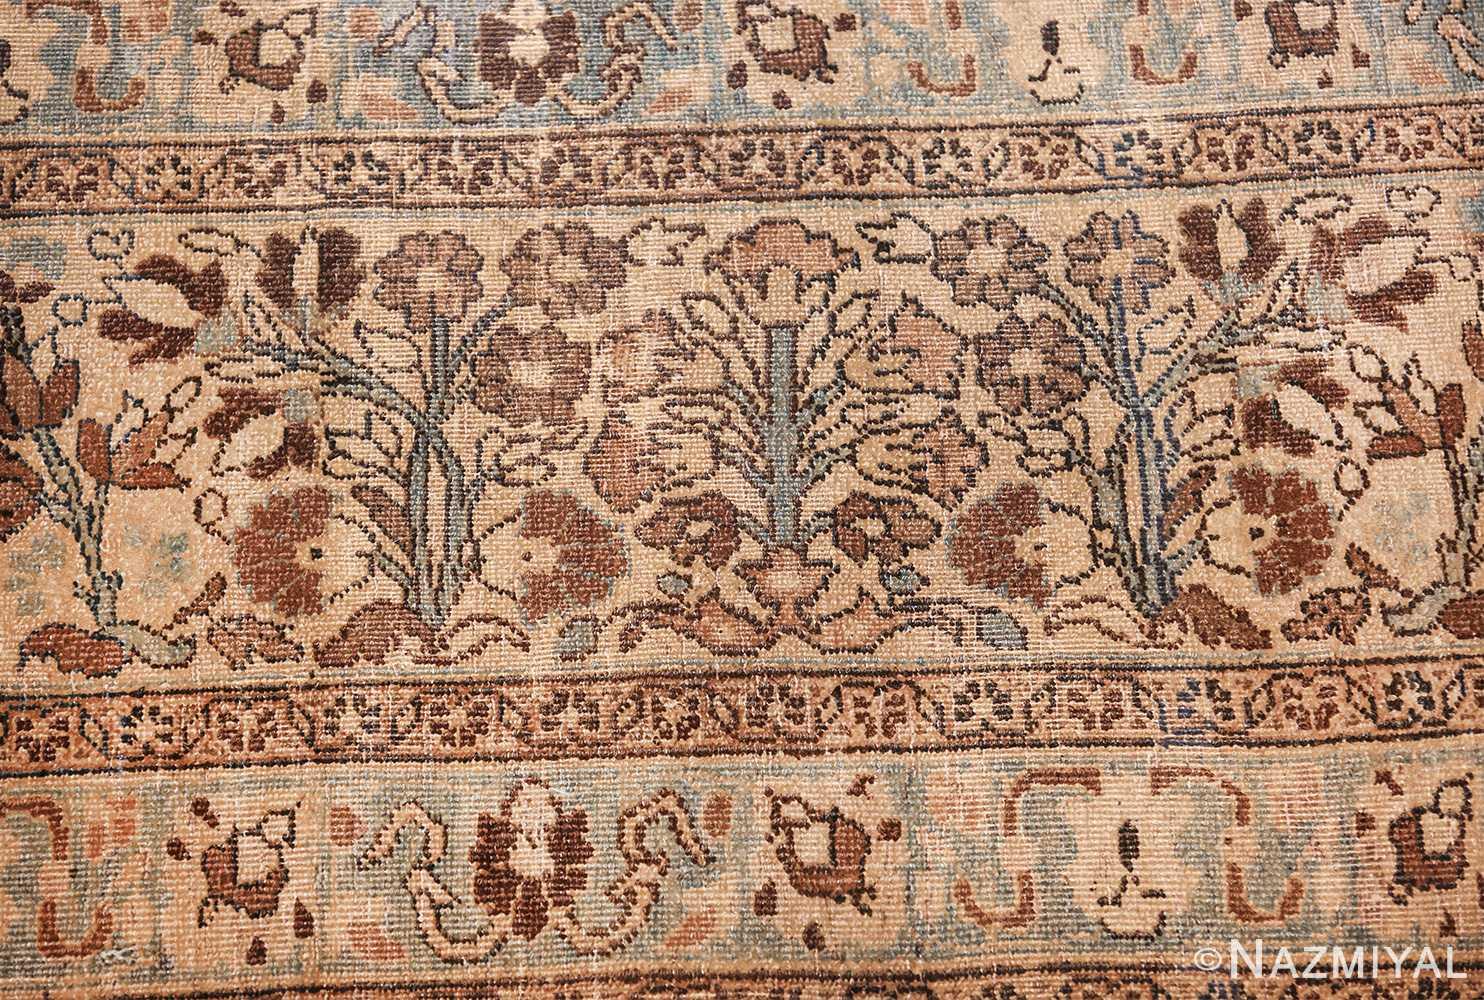 antique navy background khorassan persian rug 49655 bushes Nazmiyal